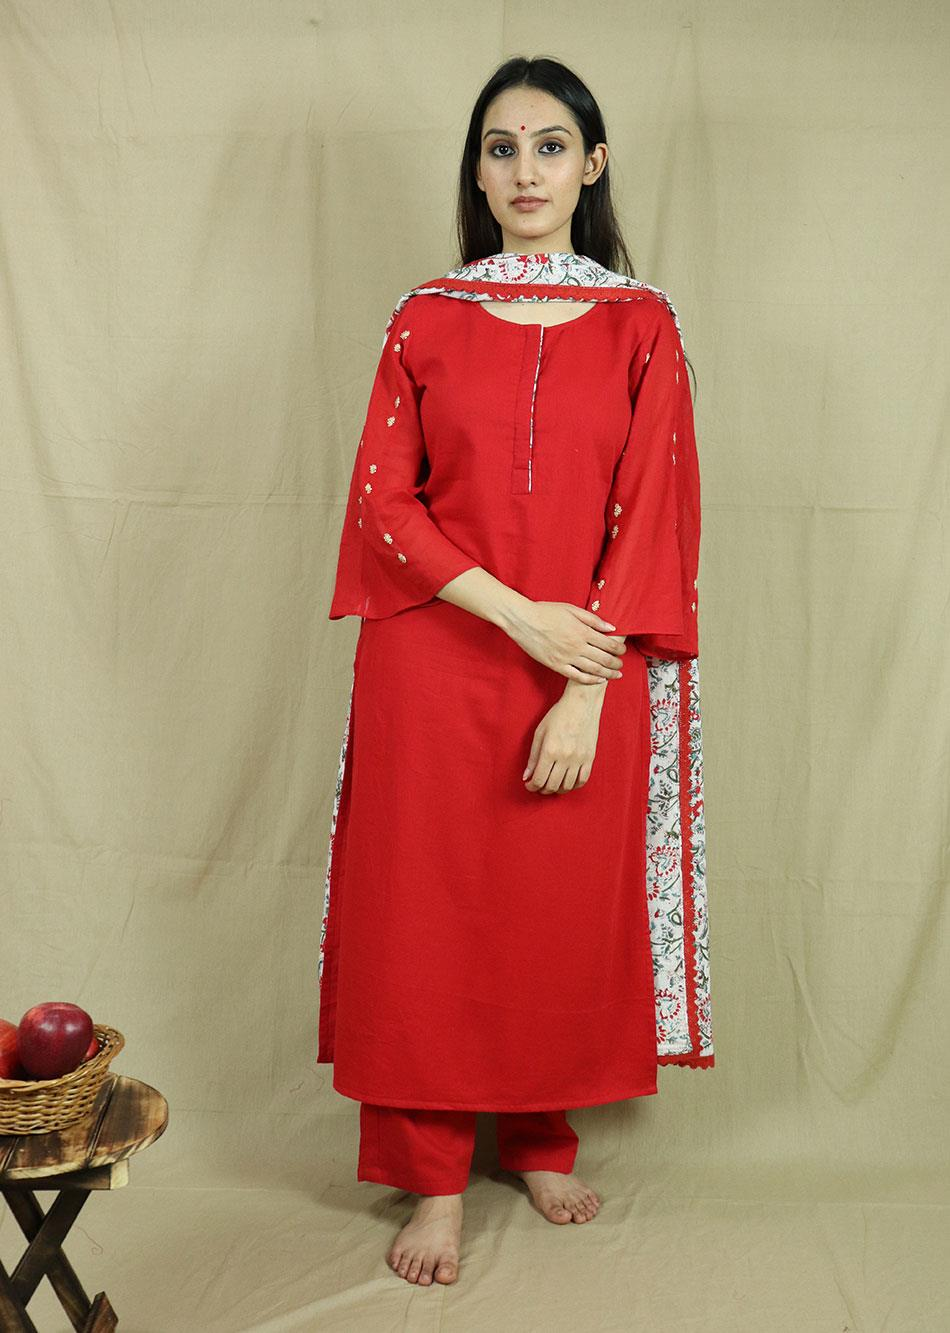 Red Straight Kurta Set (With printed dupatta) By Jovi Fashion